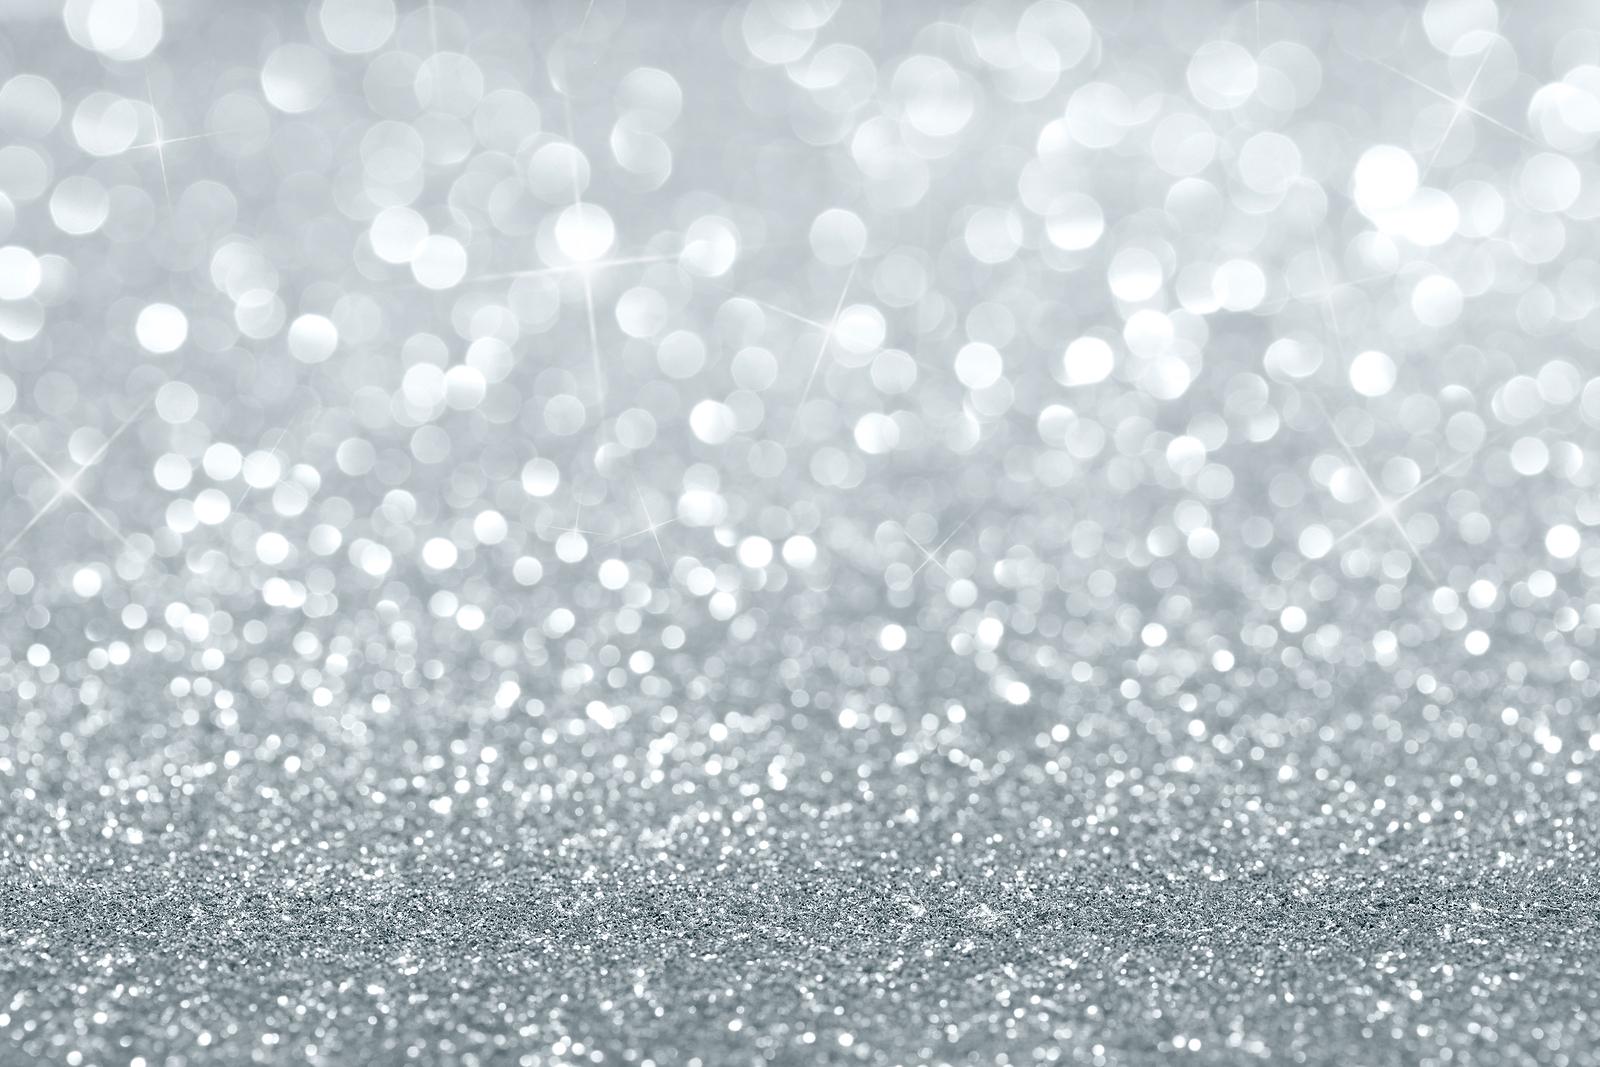 Nail Polish for the Holidays   Mooshworldcom by Olga Kay 1600x1067